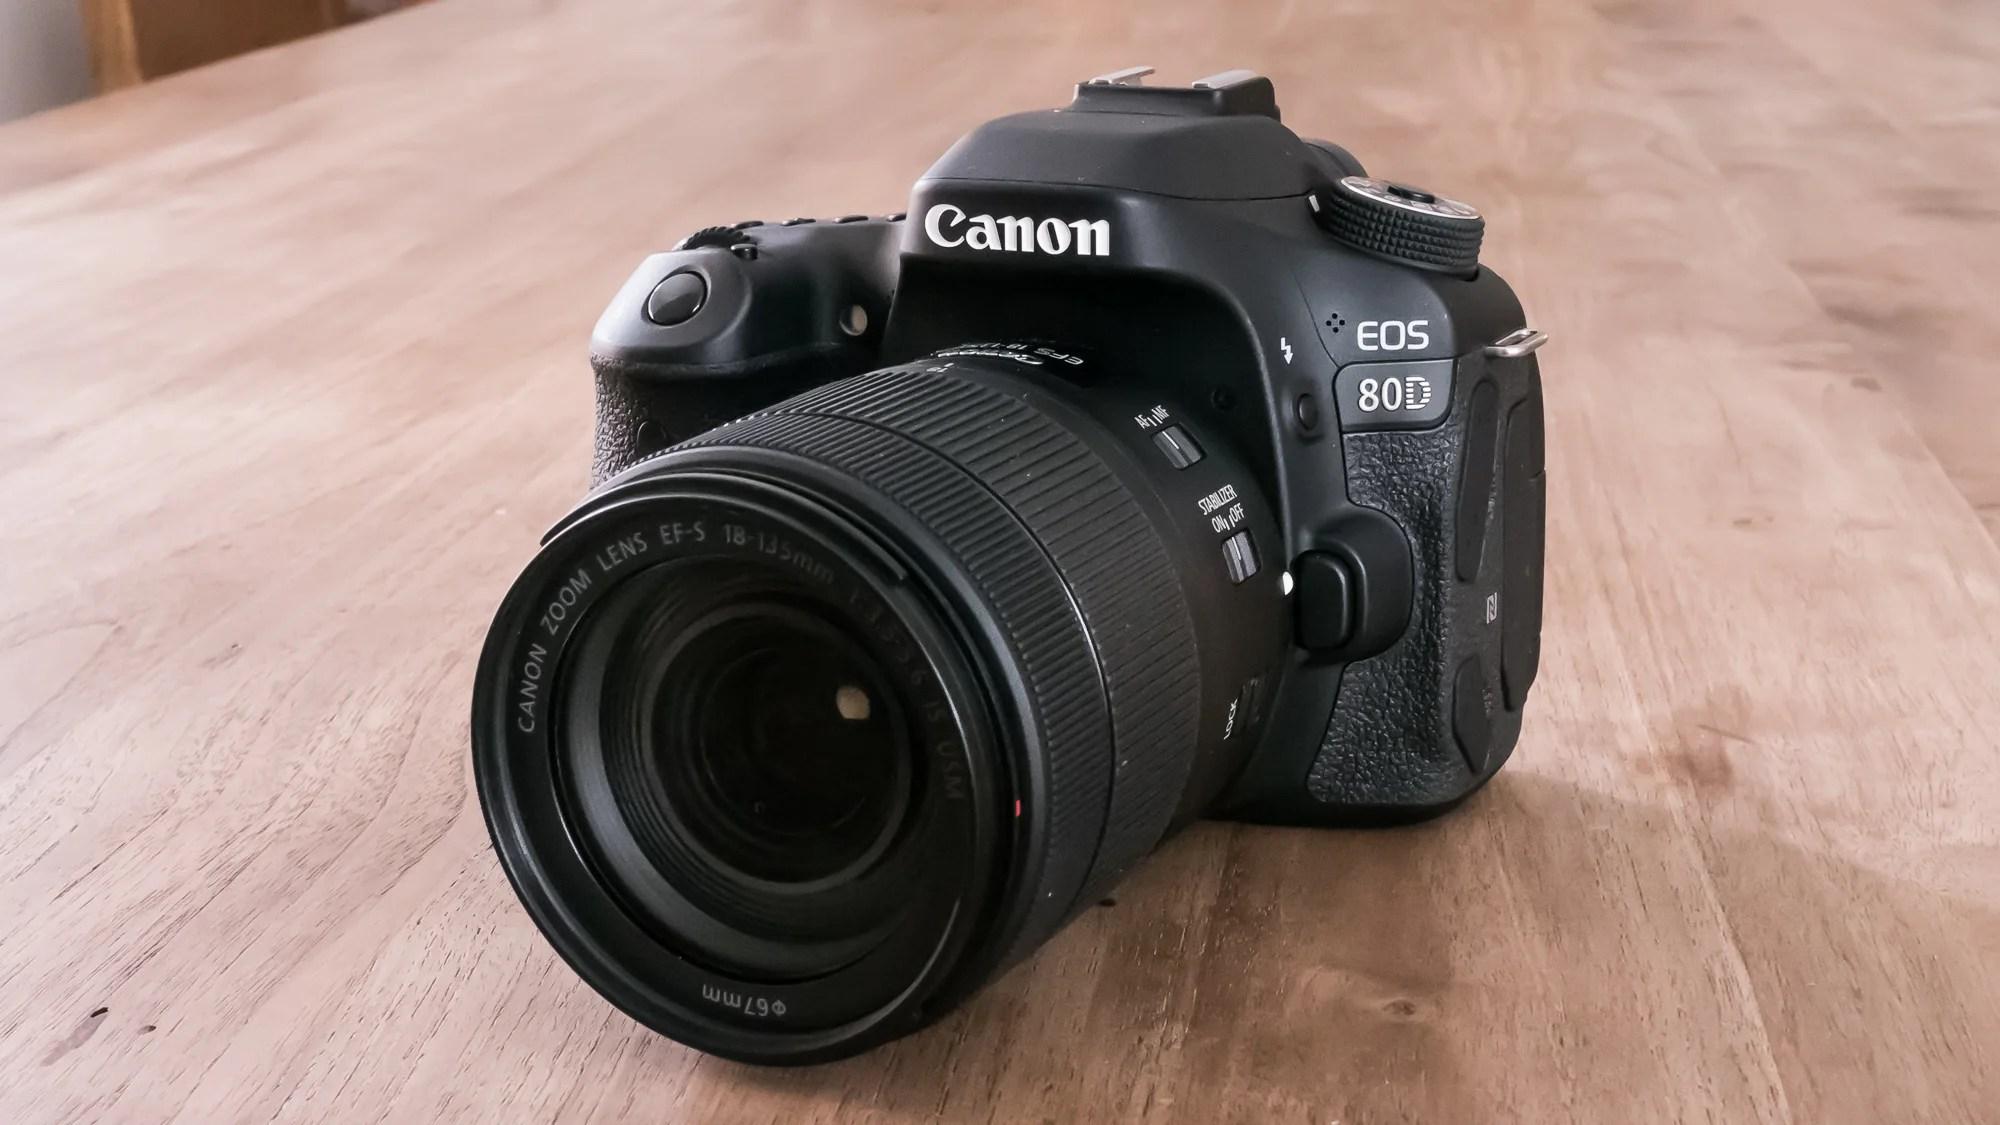 Mind Canon Eos Should You Wait Eos Expert Reviews Canon 80d Mark Ii Release Date Canon 80d Release Date Uk dpreview Canon 80d Release Date